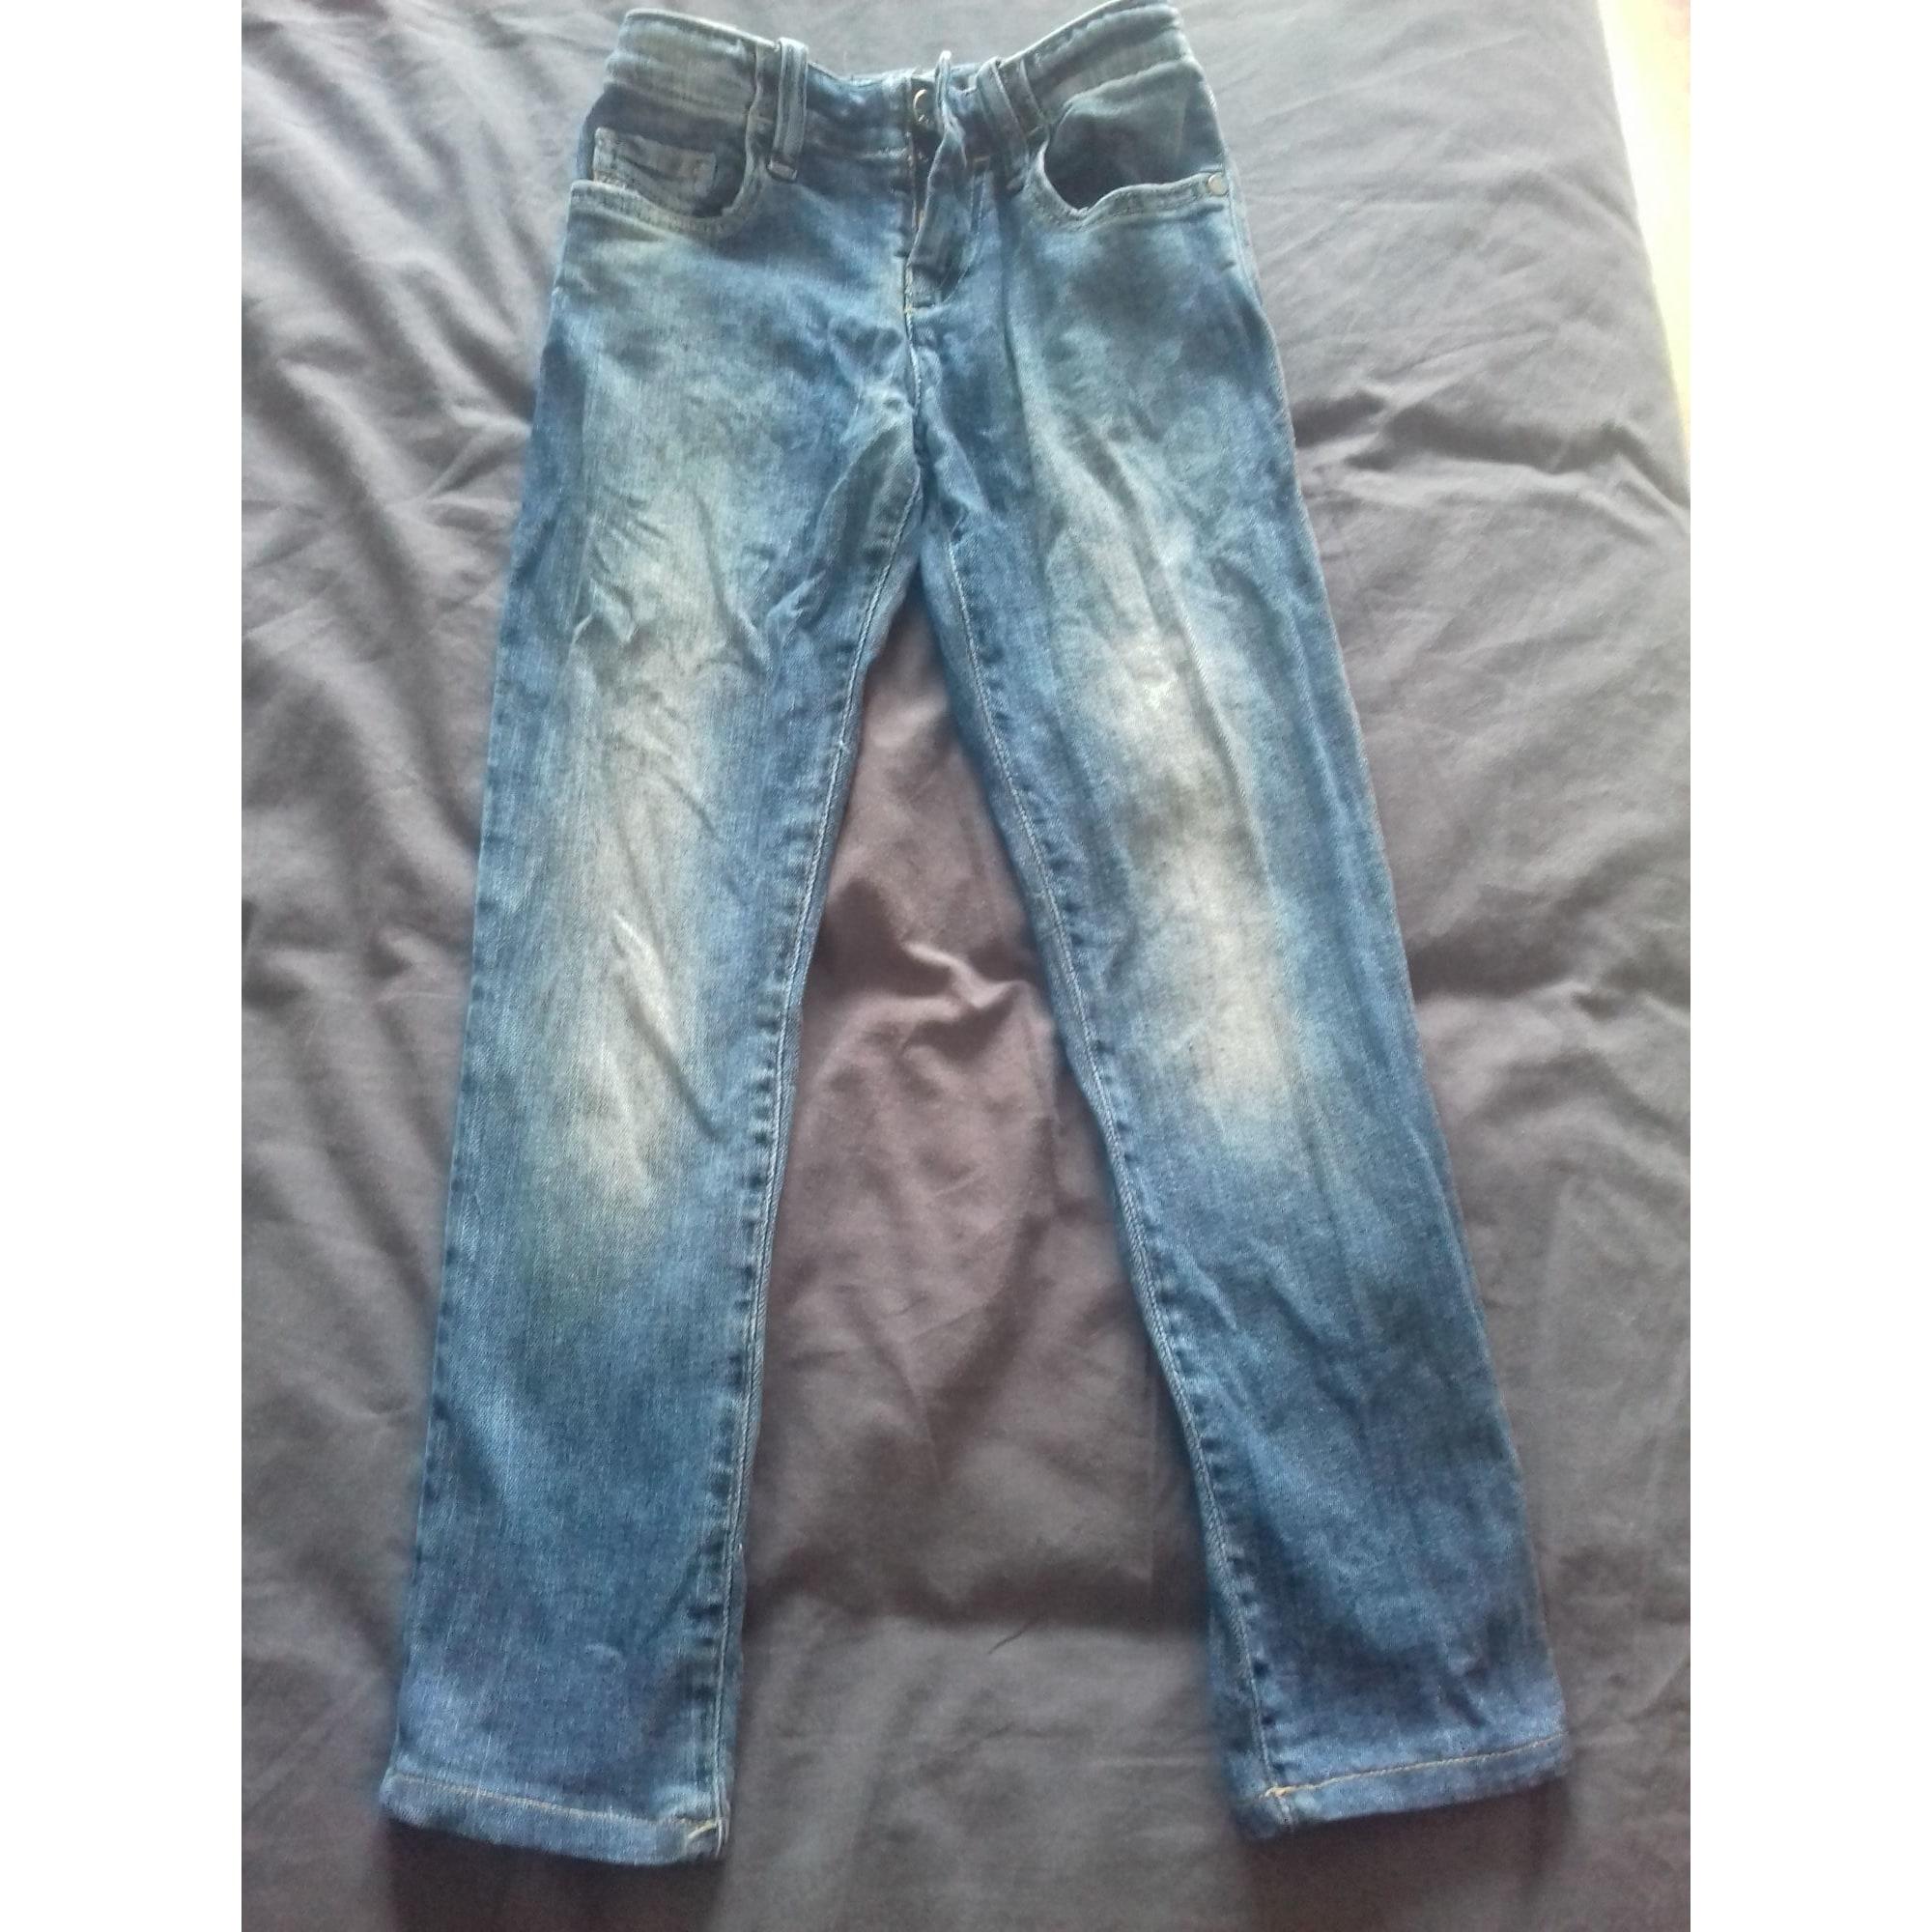 Jeans droit DIESEL Bleu, bleu marine, bleu turquoise